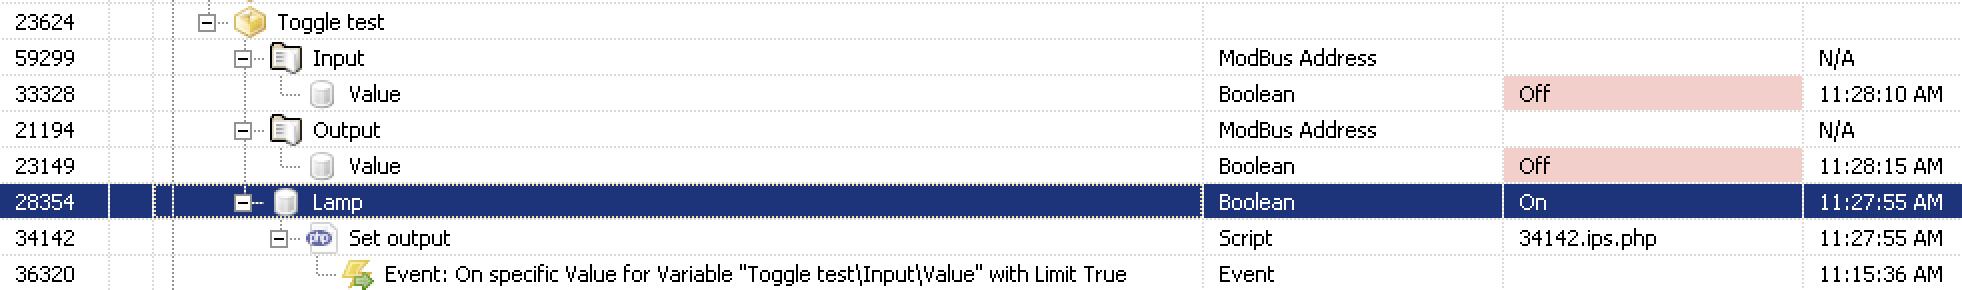 Toggle test: benodigde objecten